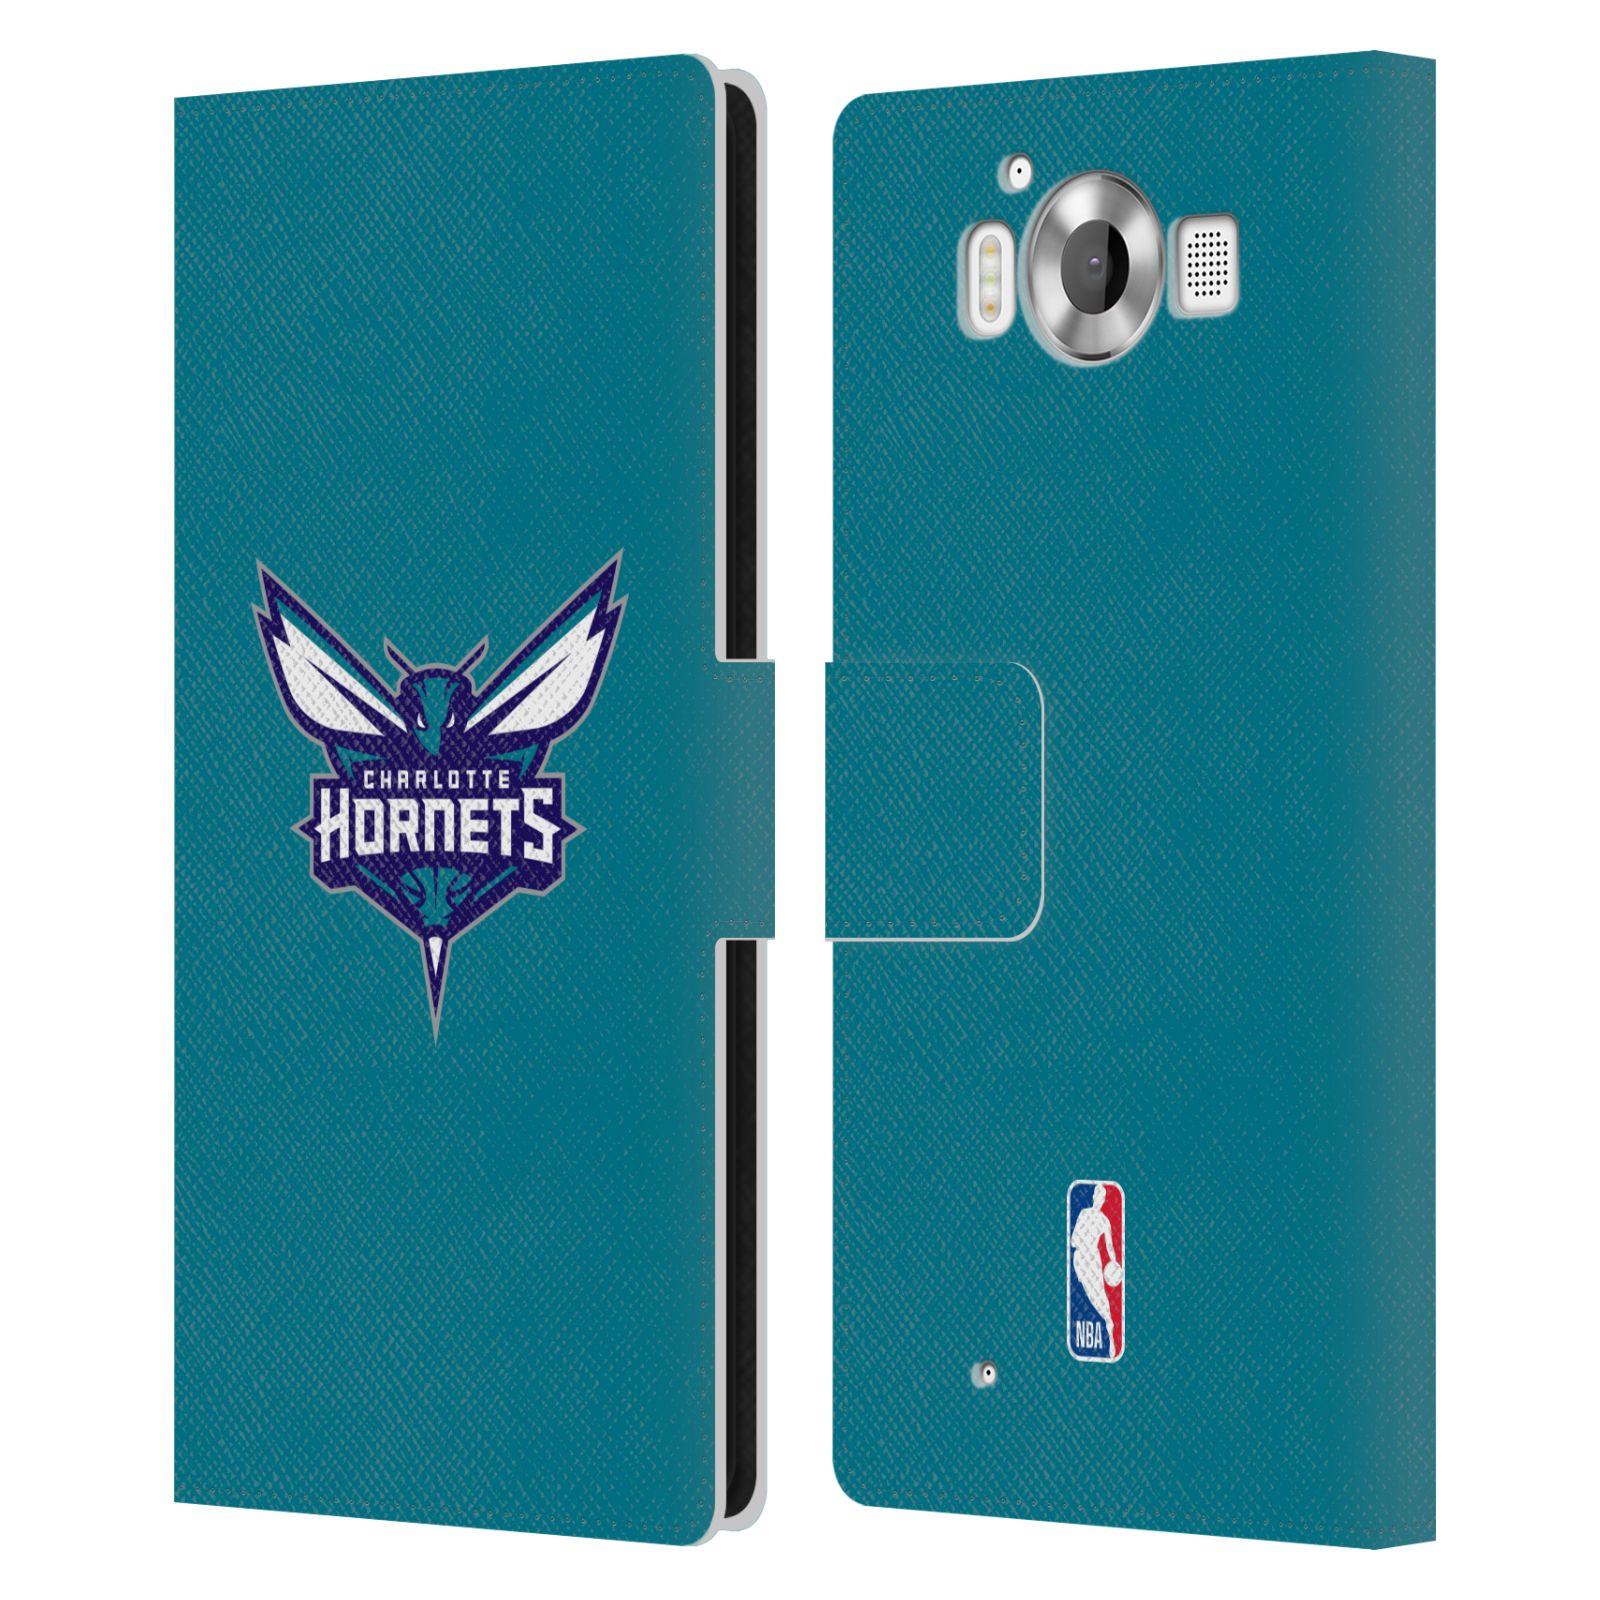 Pouzdro na mobil Nokia Lumia 950 - Head Case -NBA - Charlotte Hornets modrá barva znak